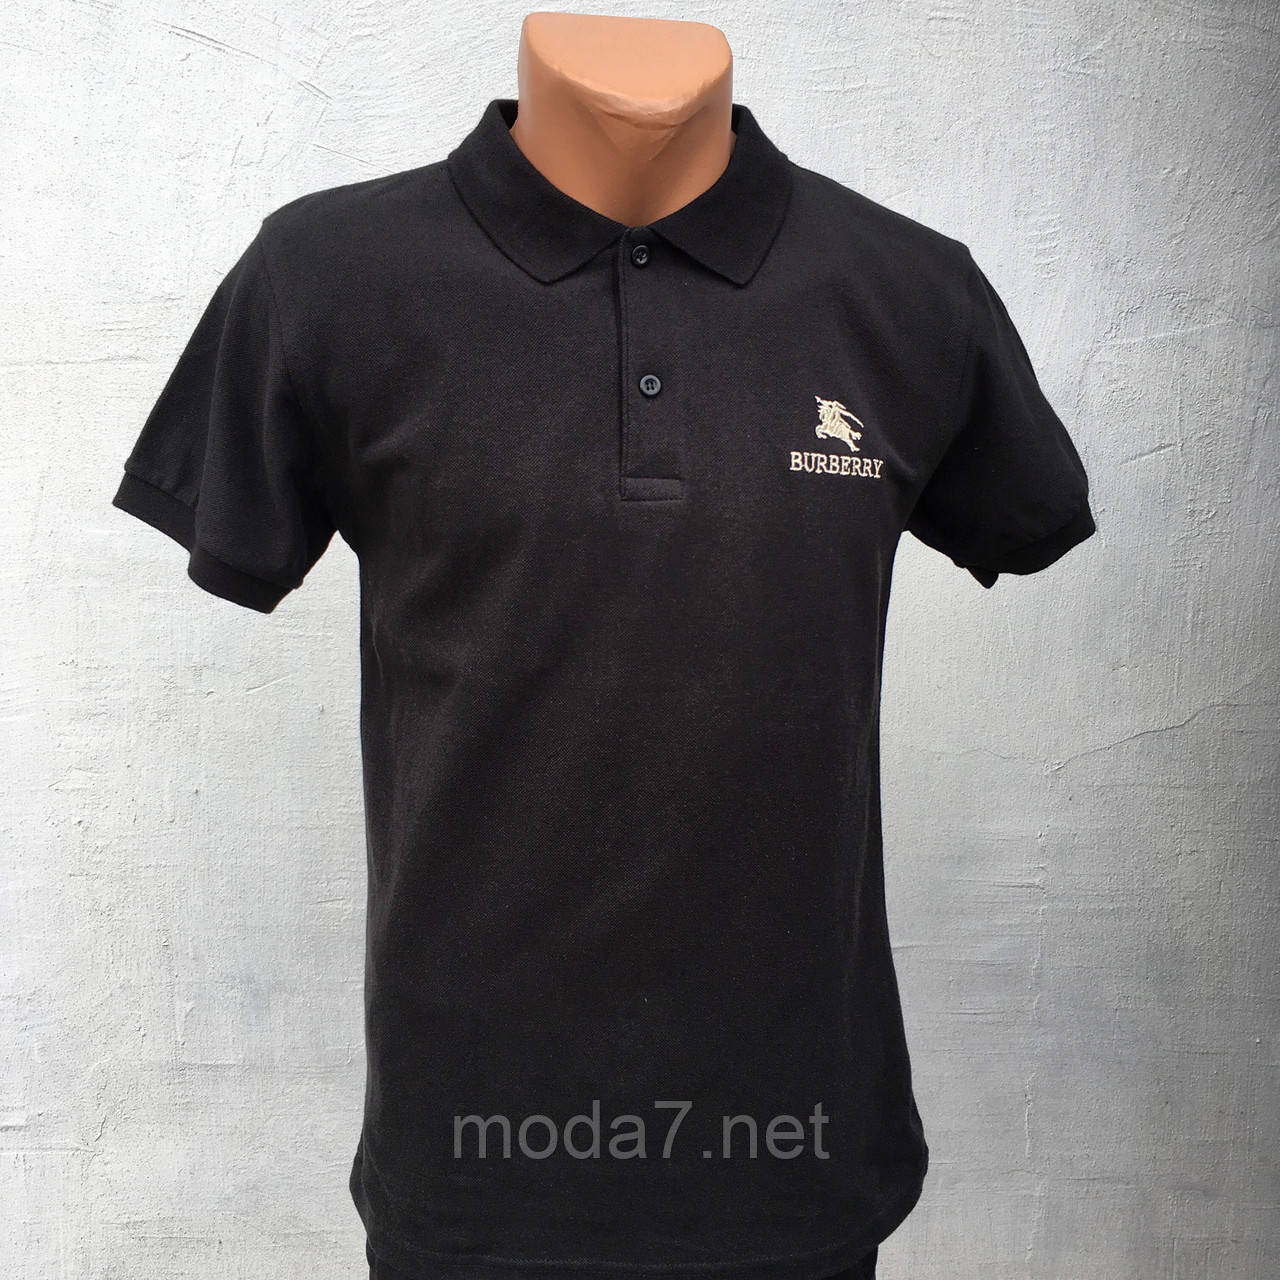 Футболка мужская черная Polo реплика